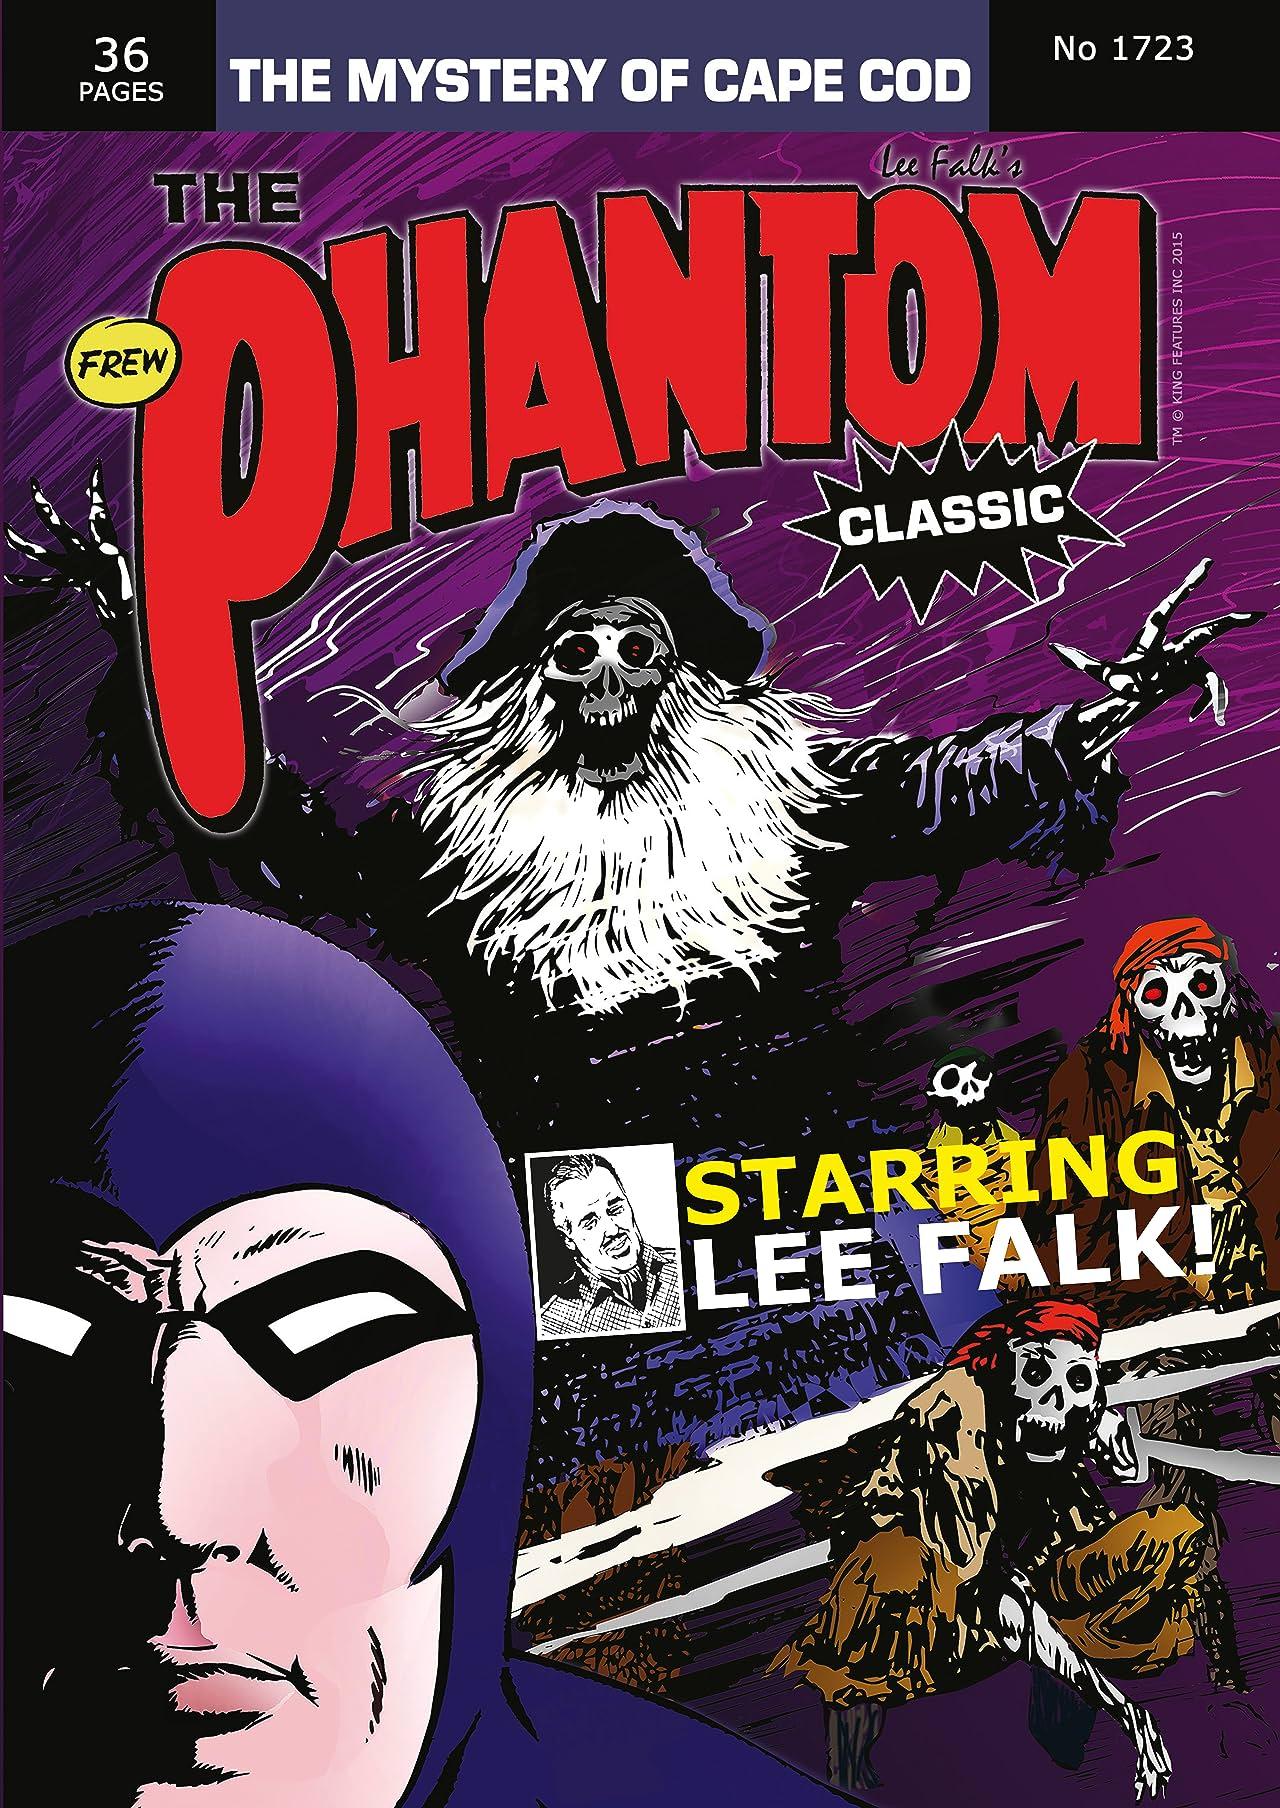 The Phantom #1723